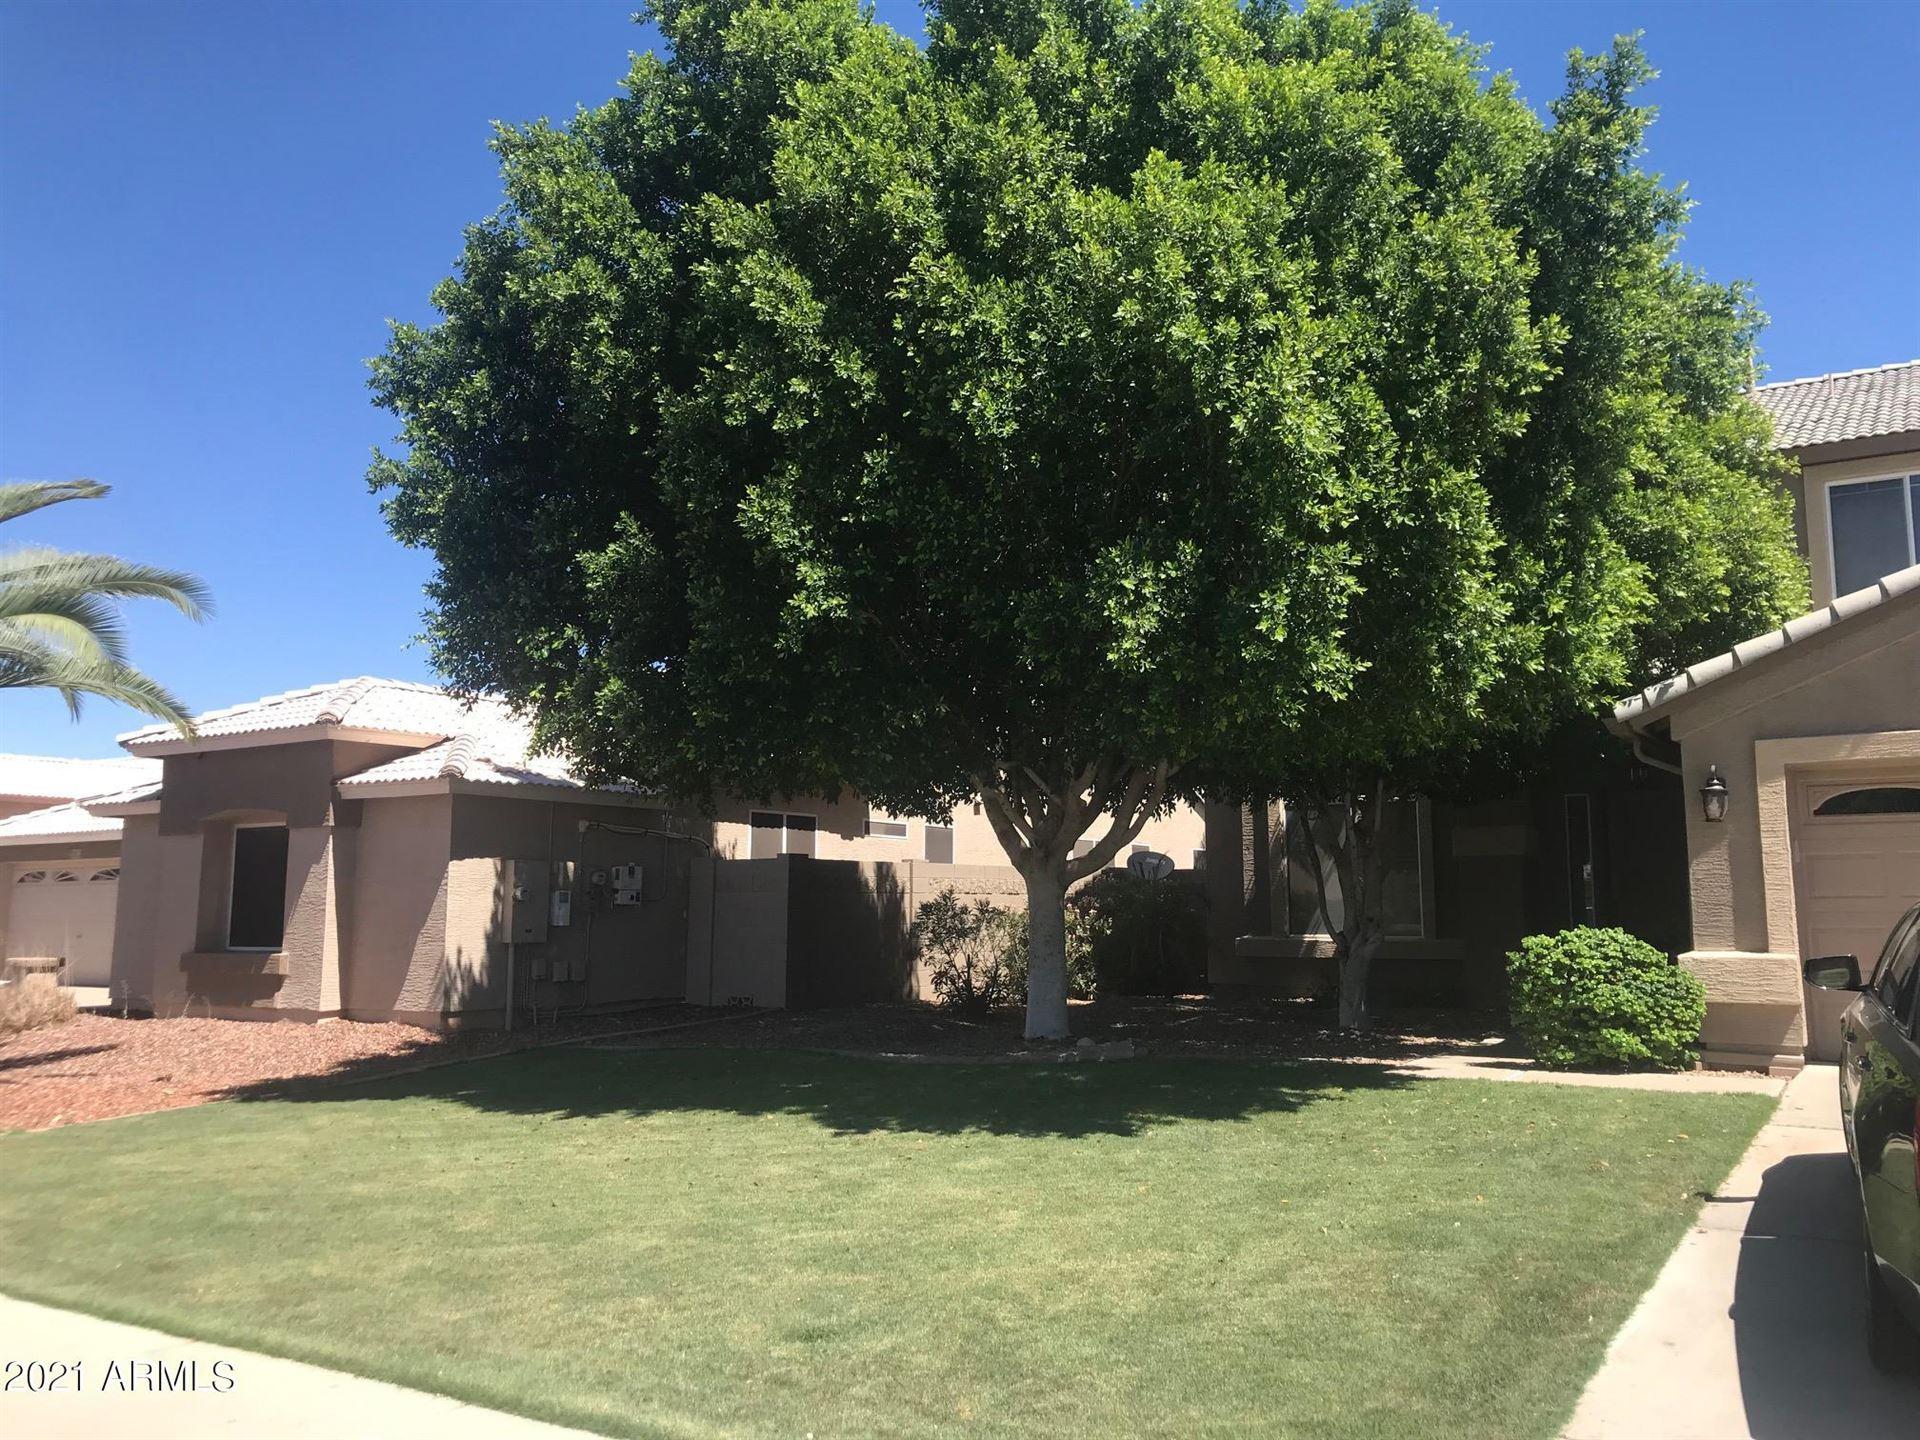 Photo of 2862 E SANTA ROSA Drive, Gilbert, AZ 85234 (MLS # 6250033)